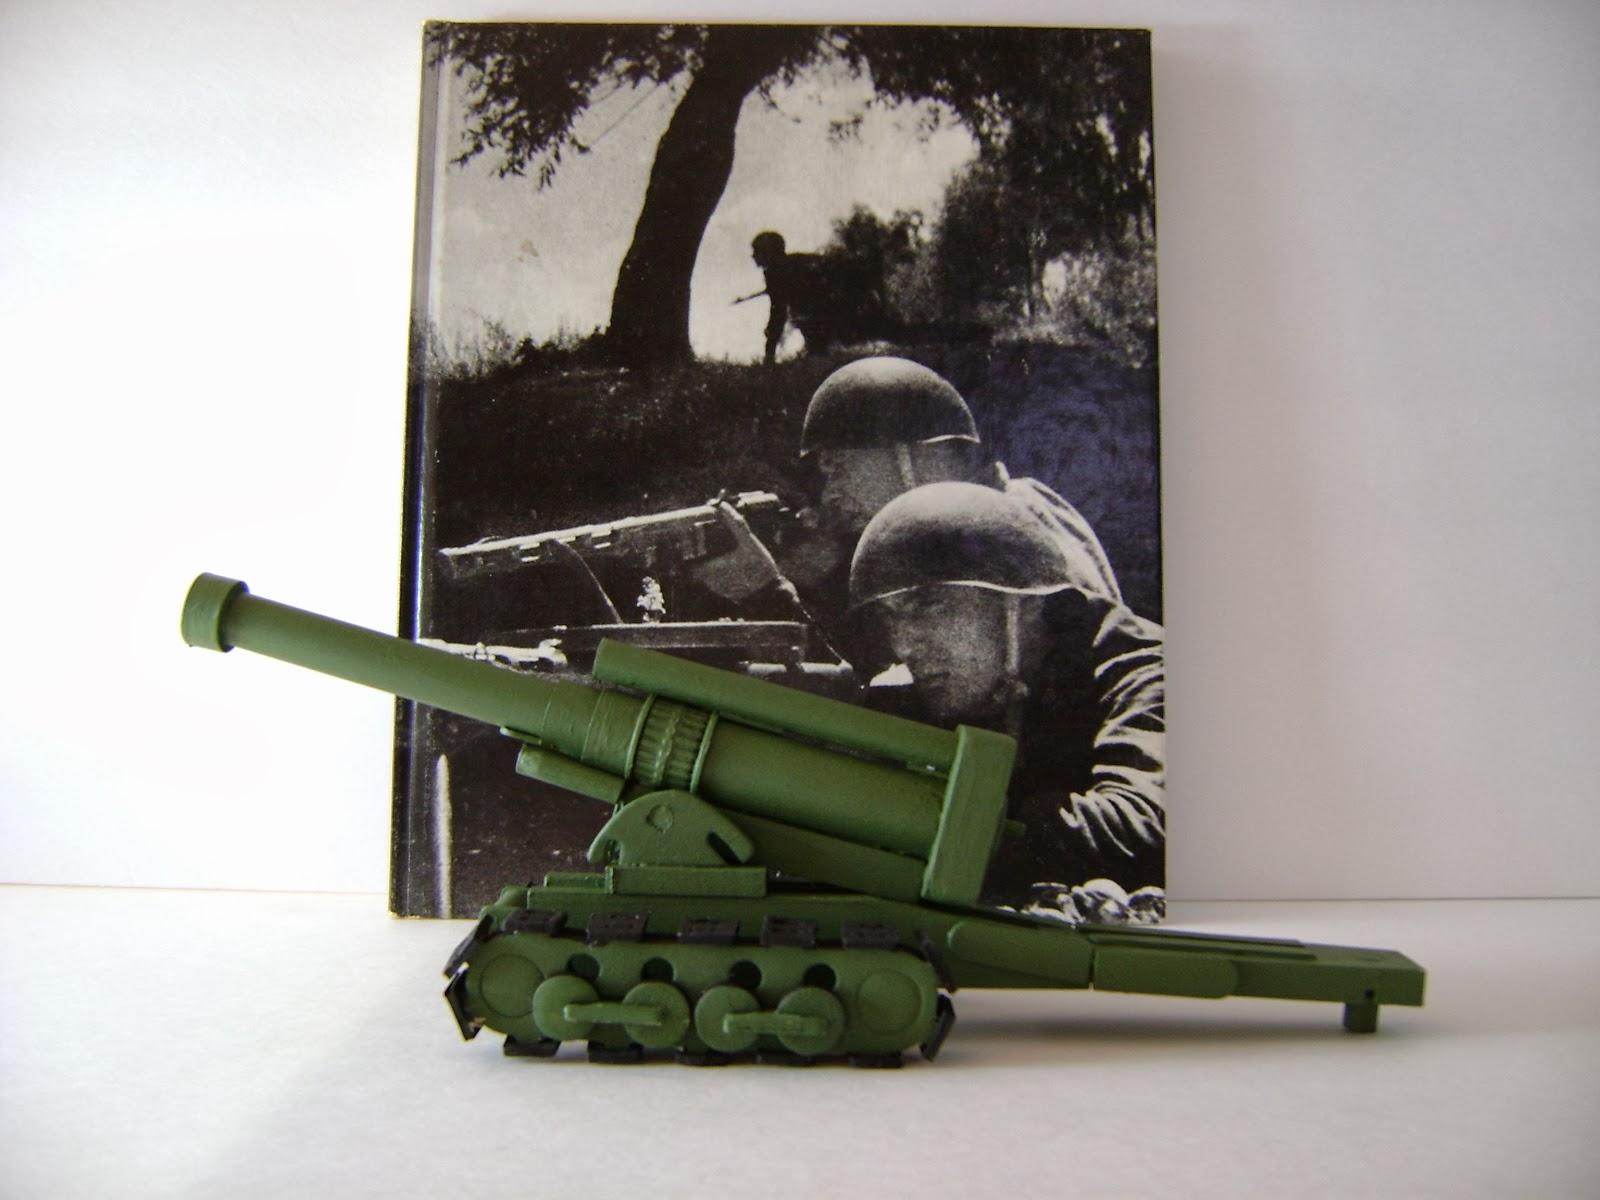 203 mm howitzer m1931